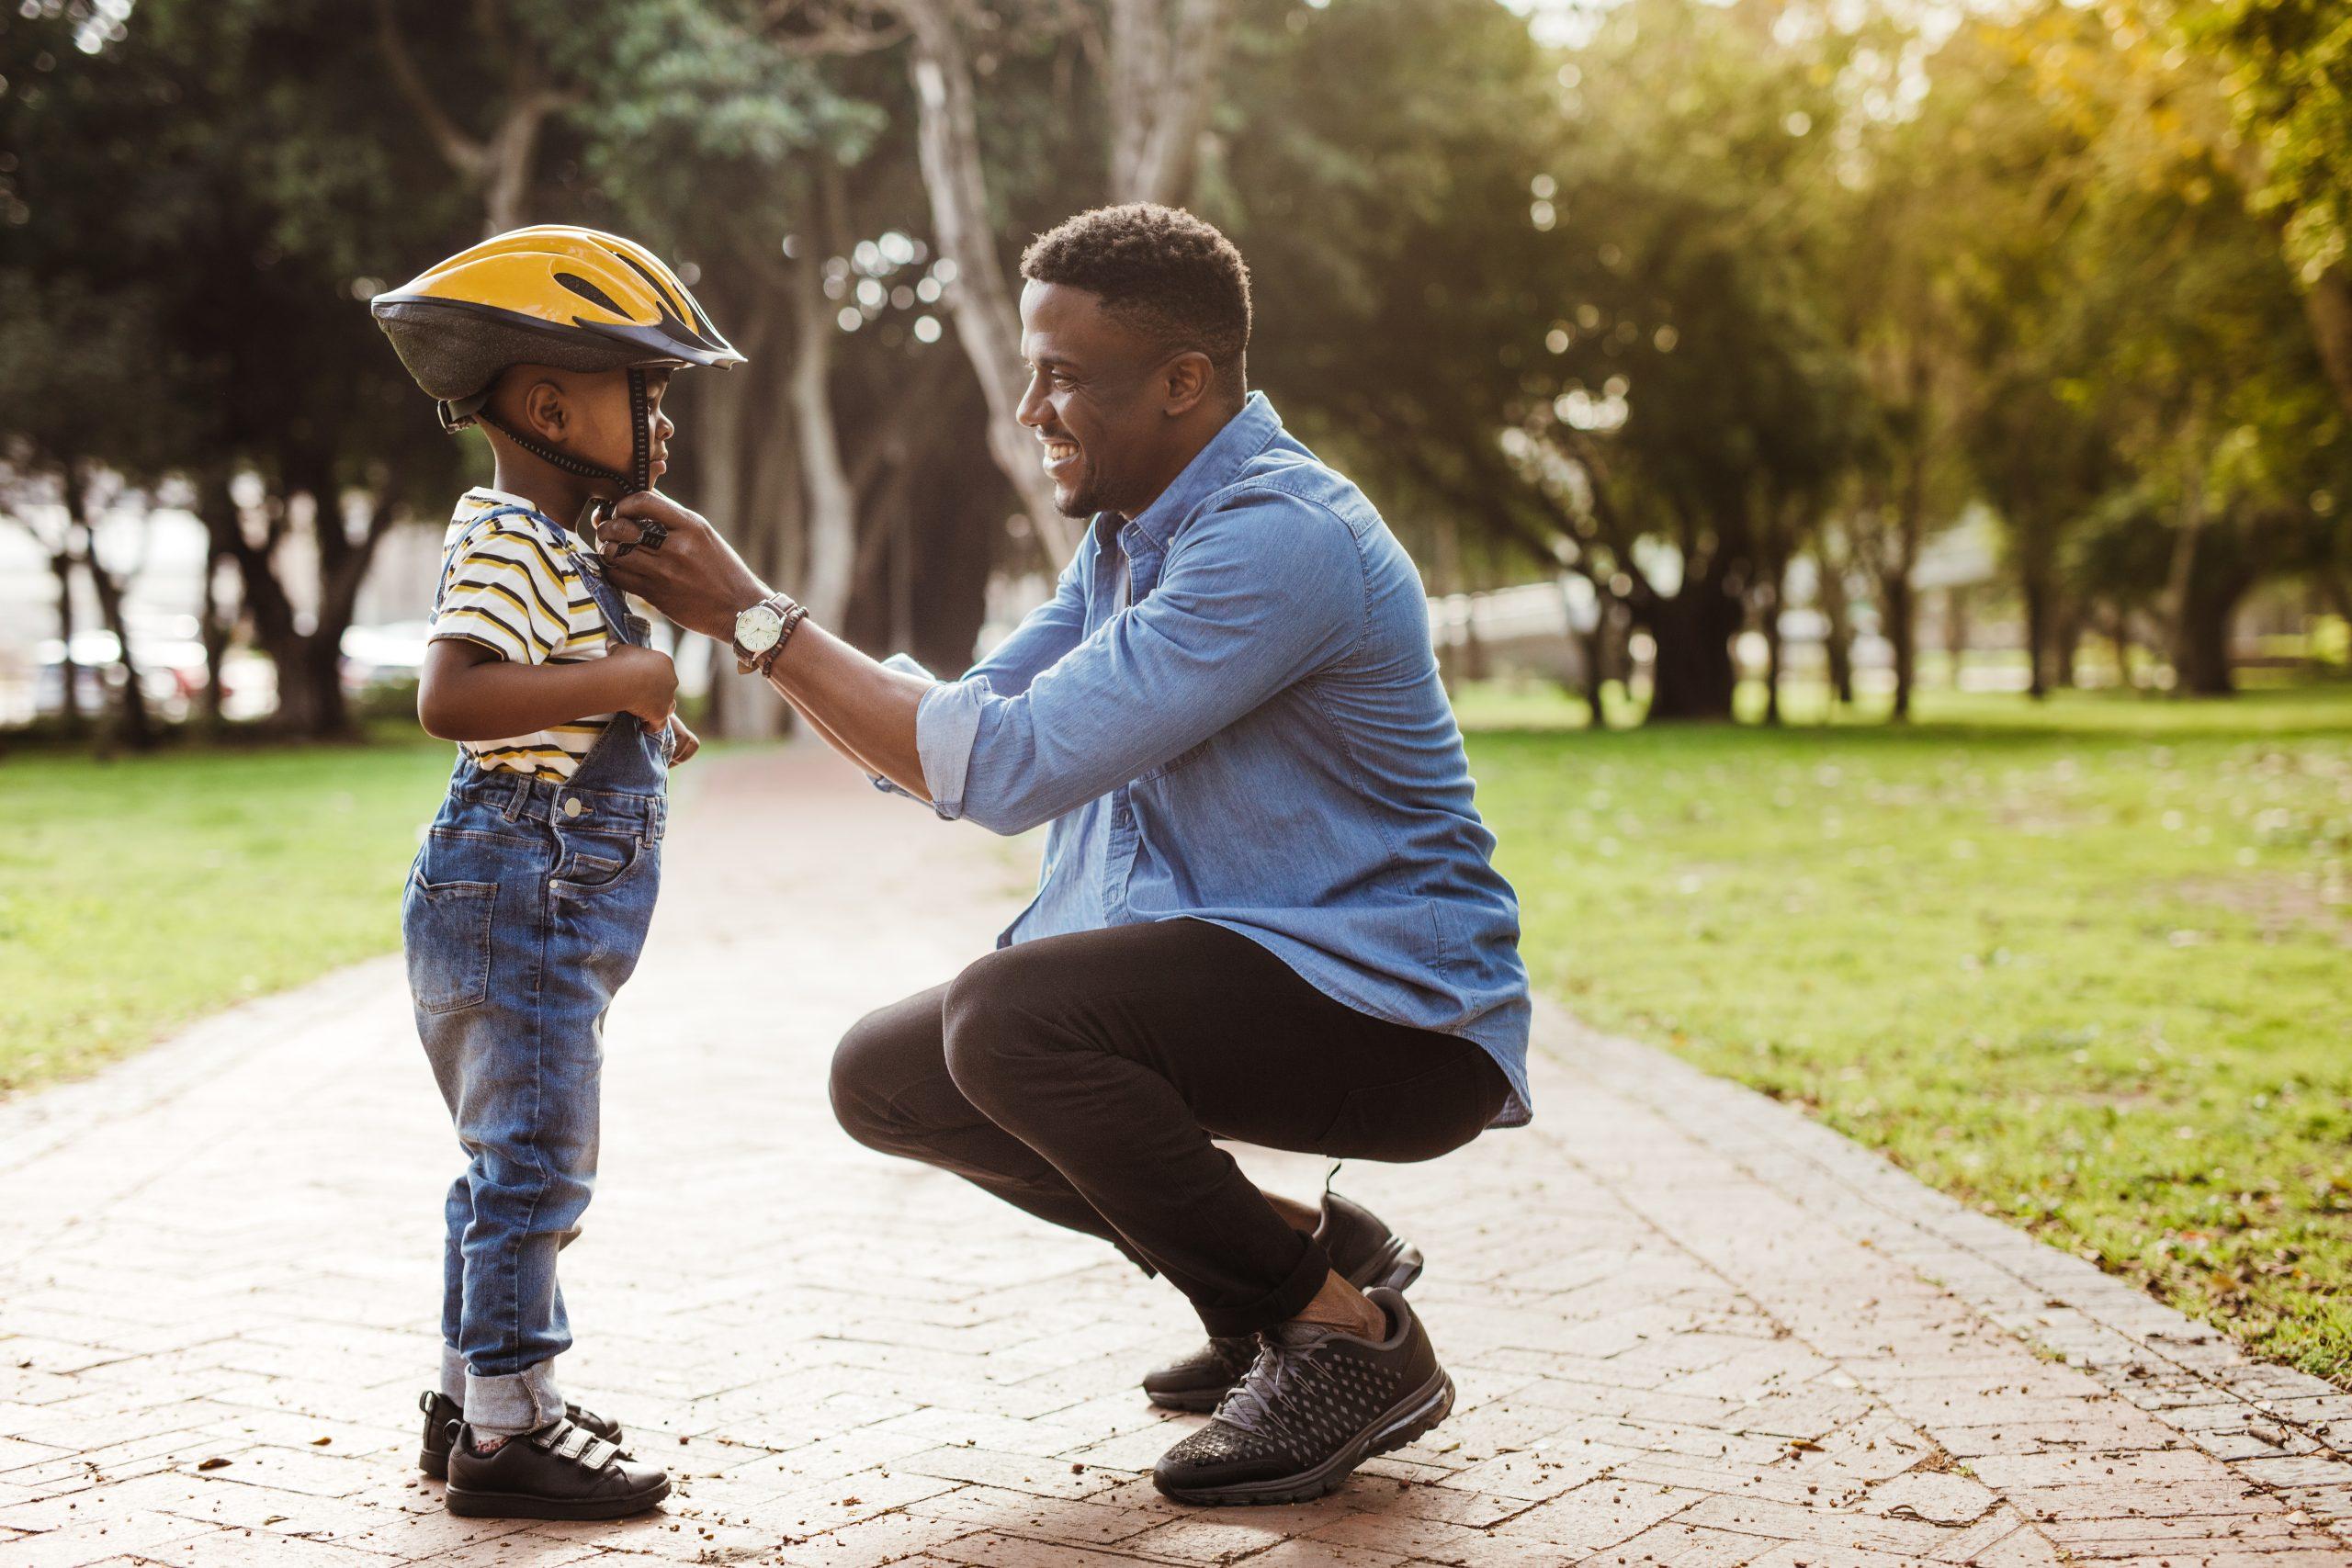 Dad Helping Little Kid with Helmet